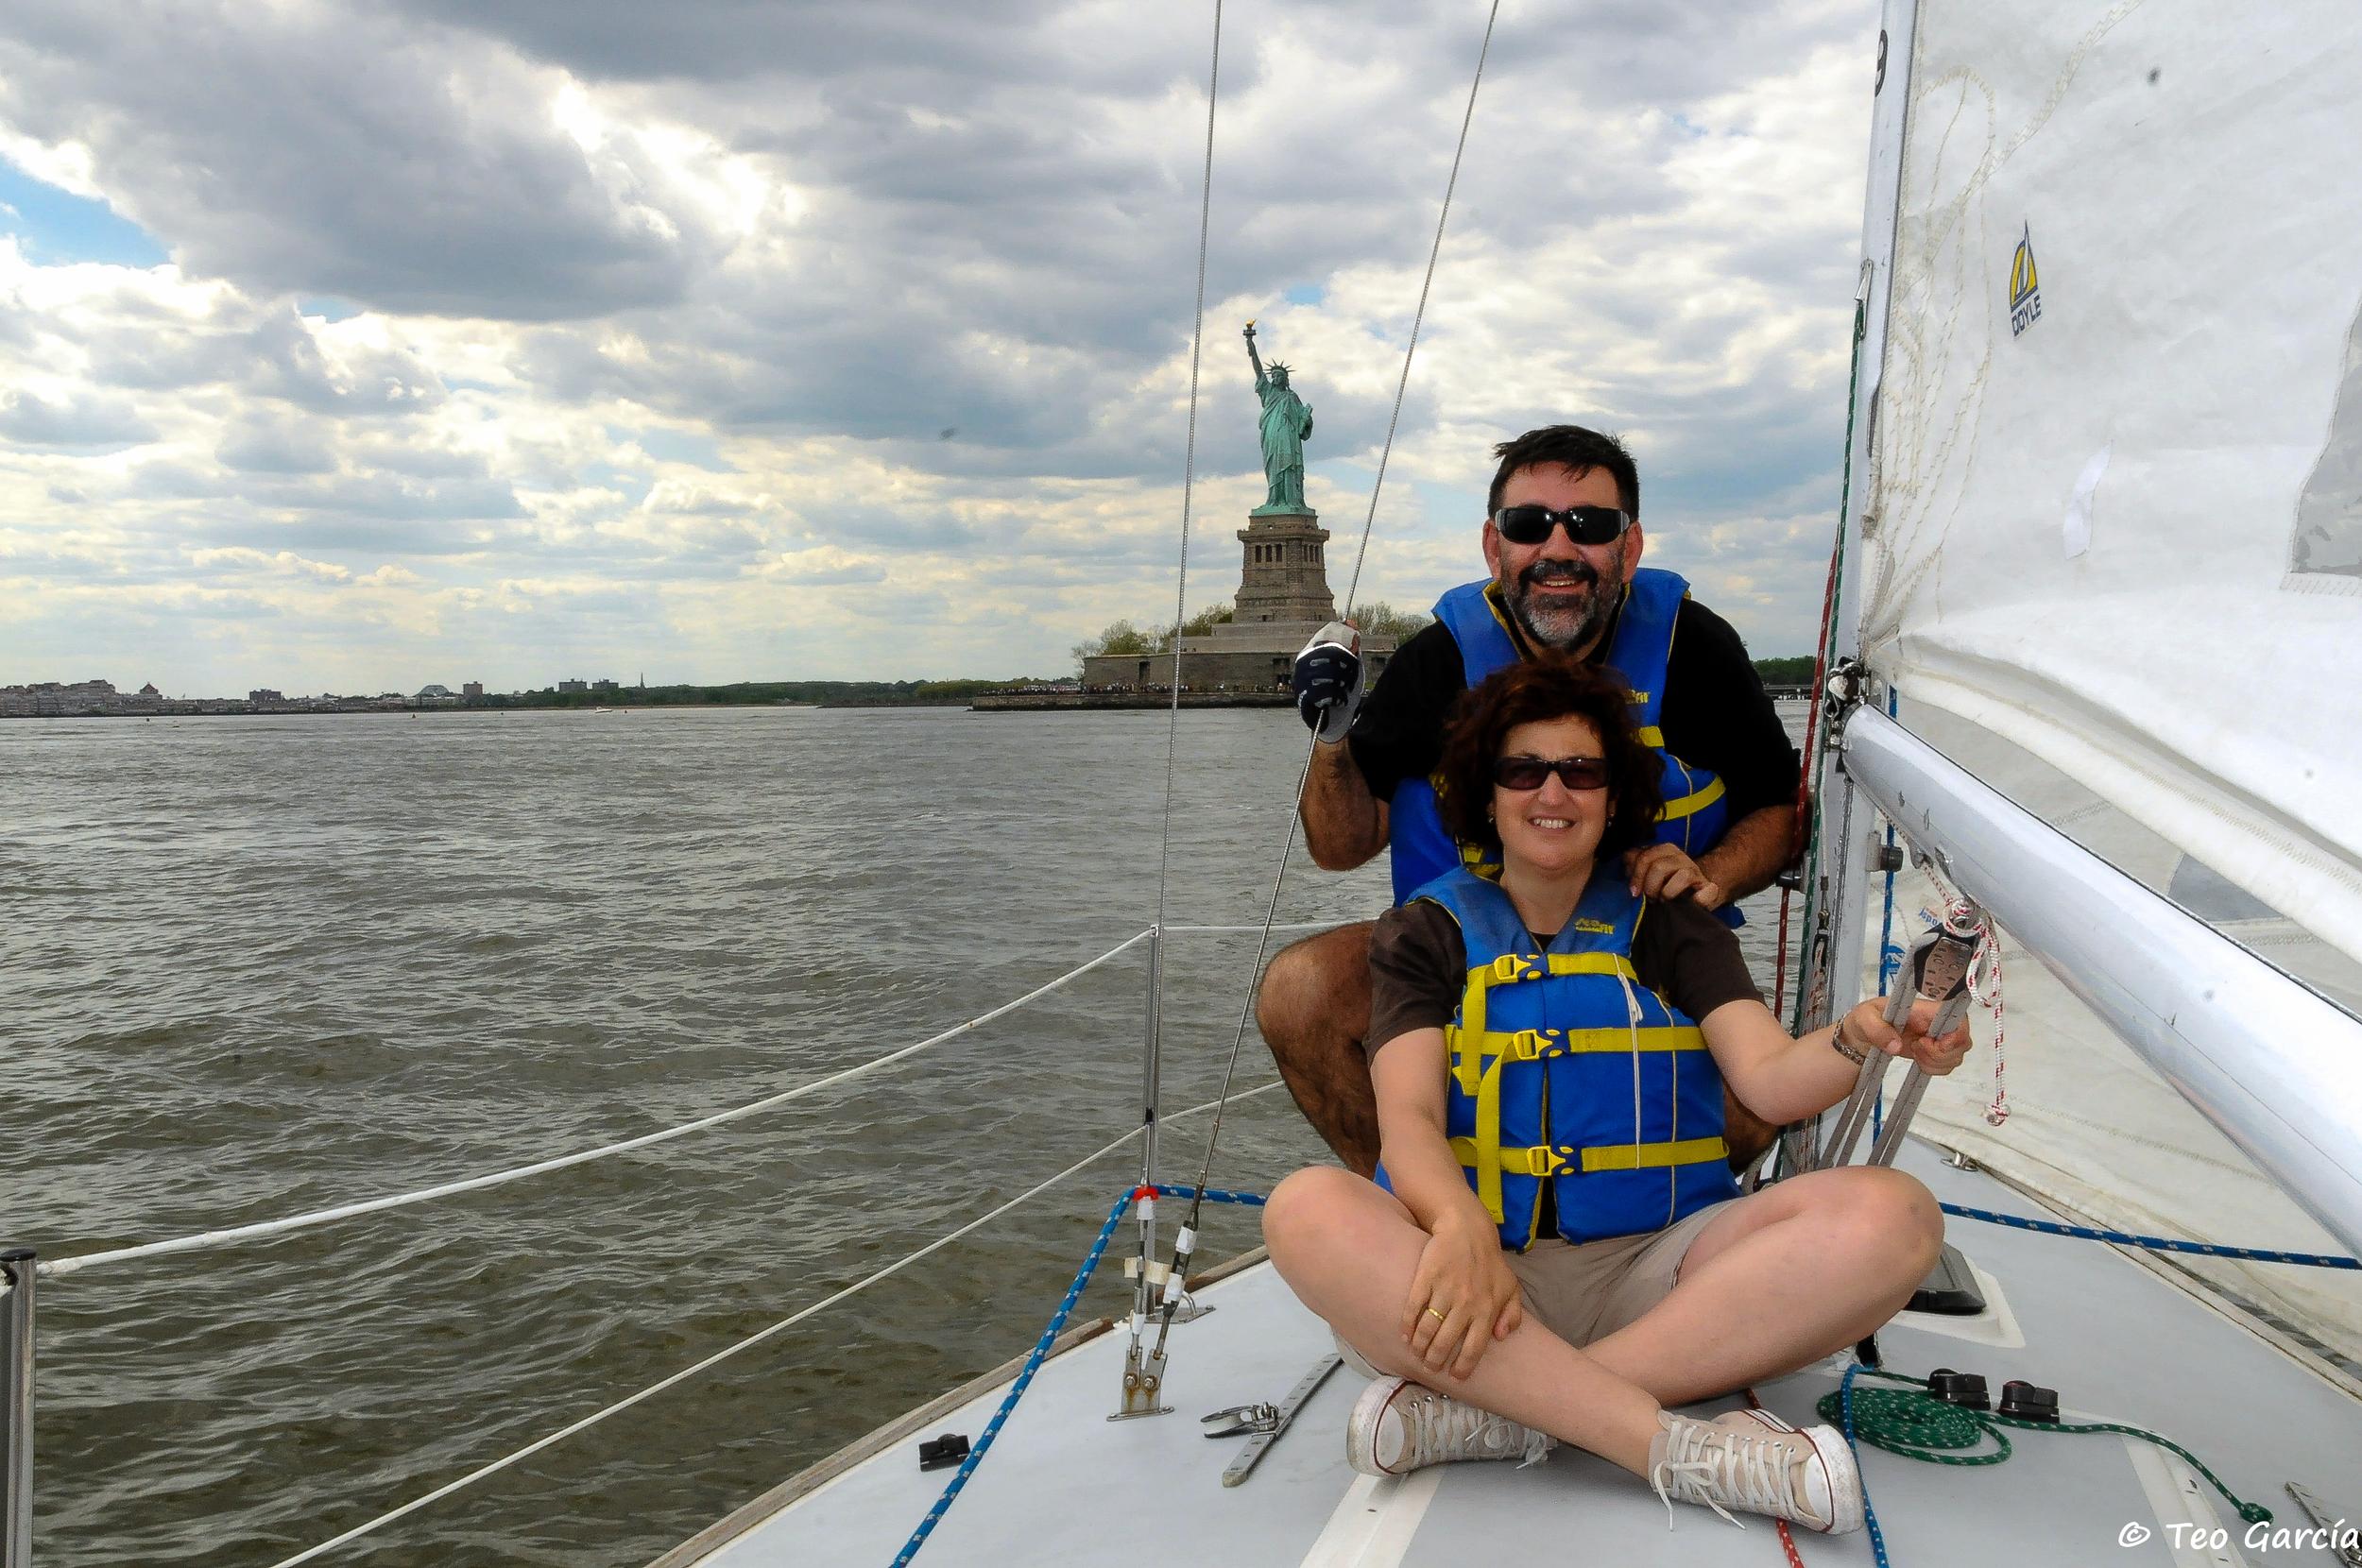 Mari y Teo with Lady Liberty.jpg